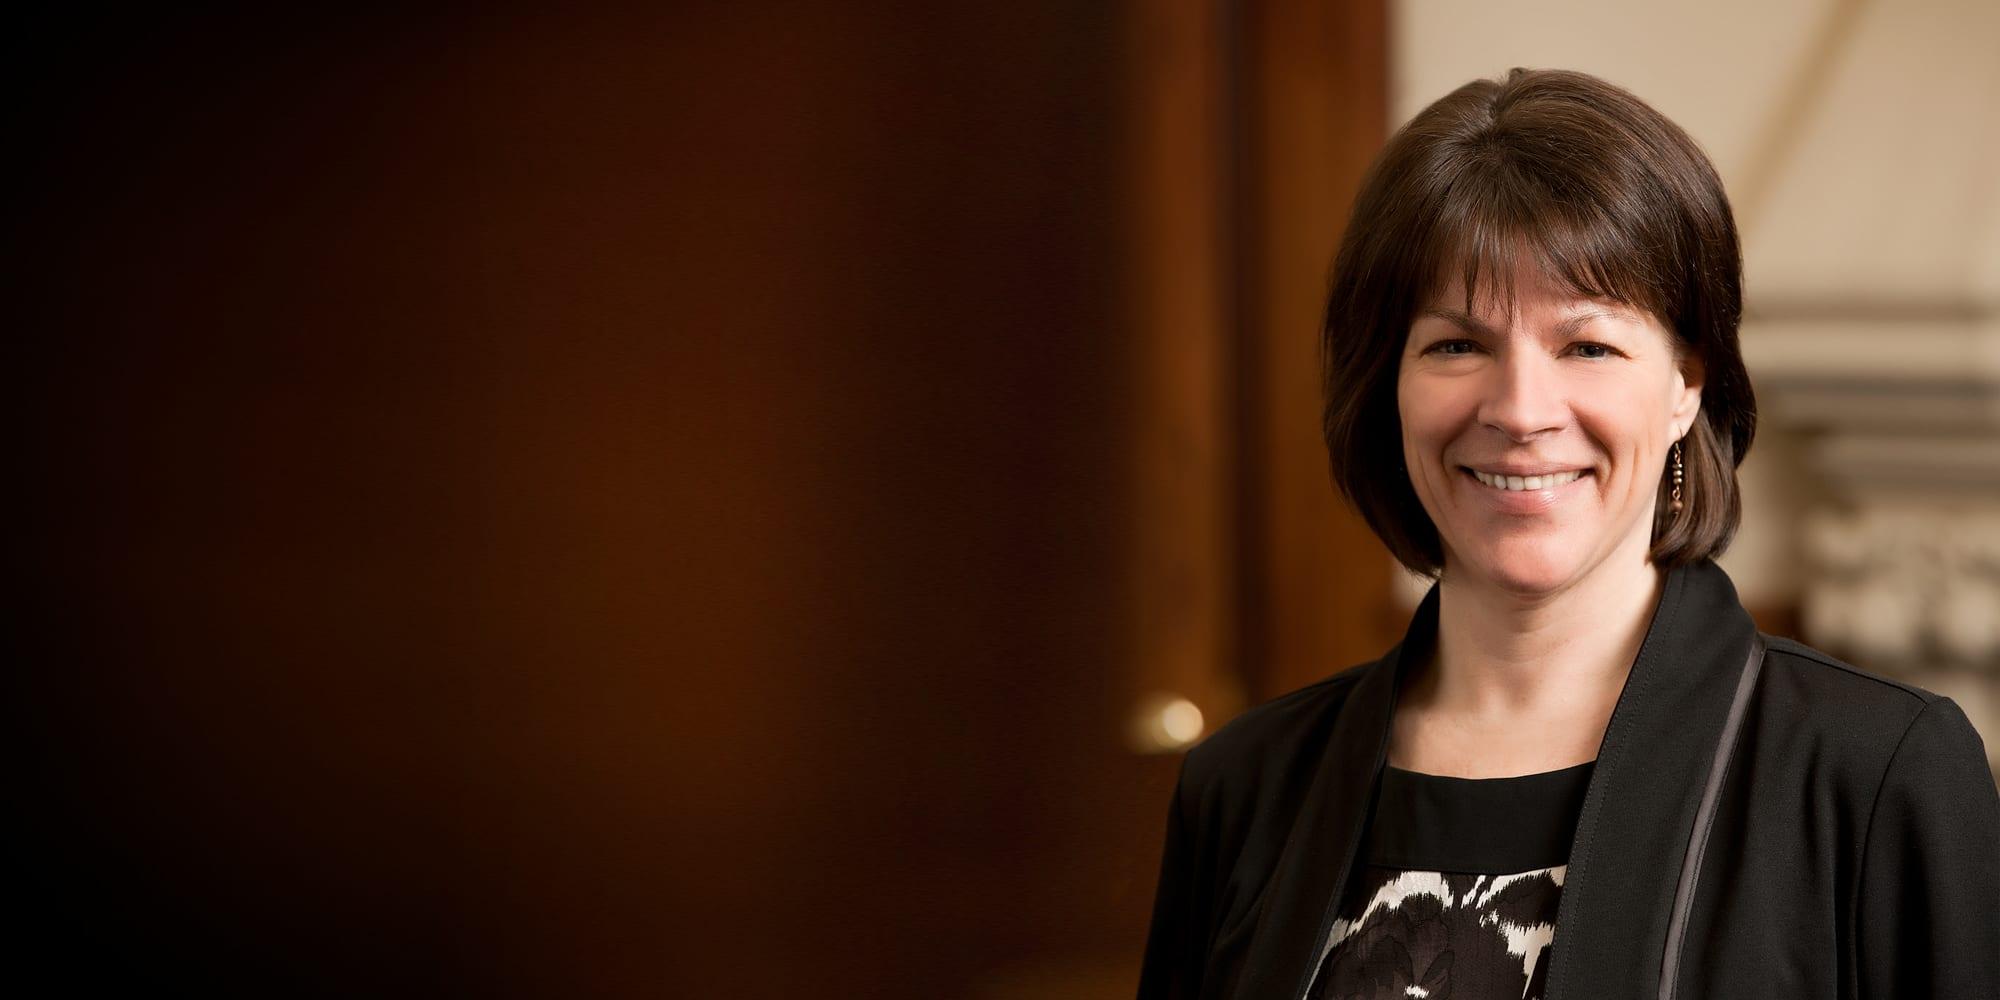 A portrait photograph of Professor Harlene Hayne smiling